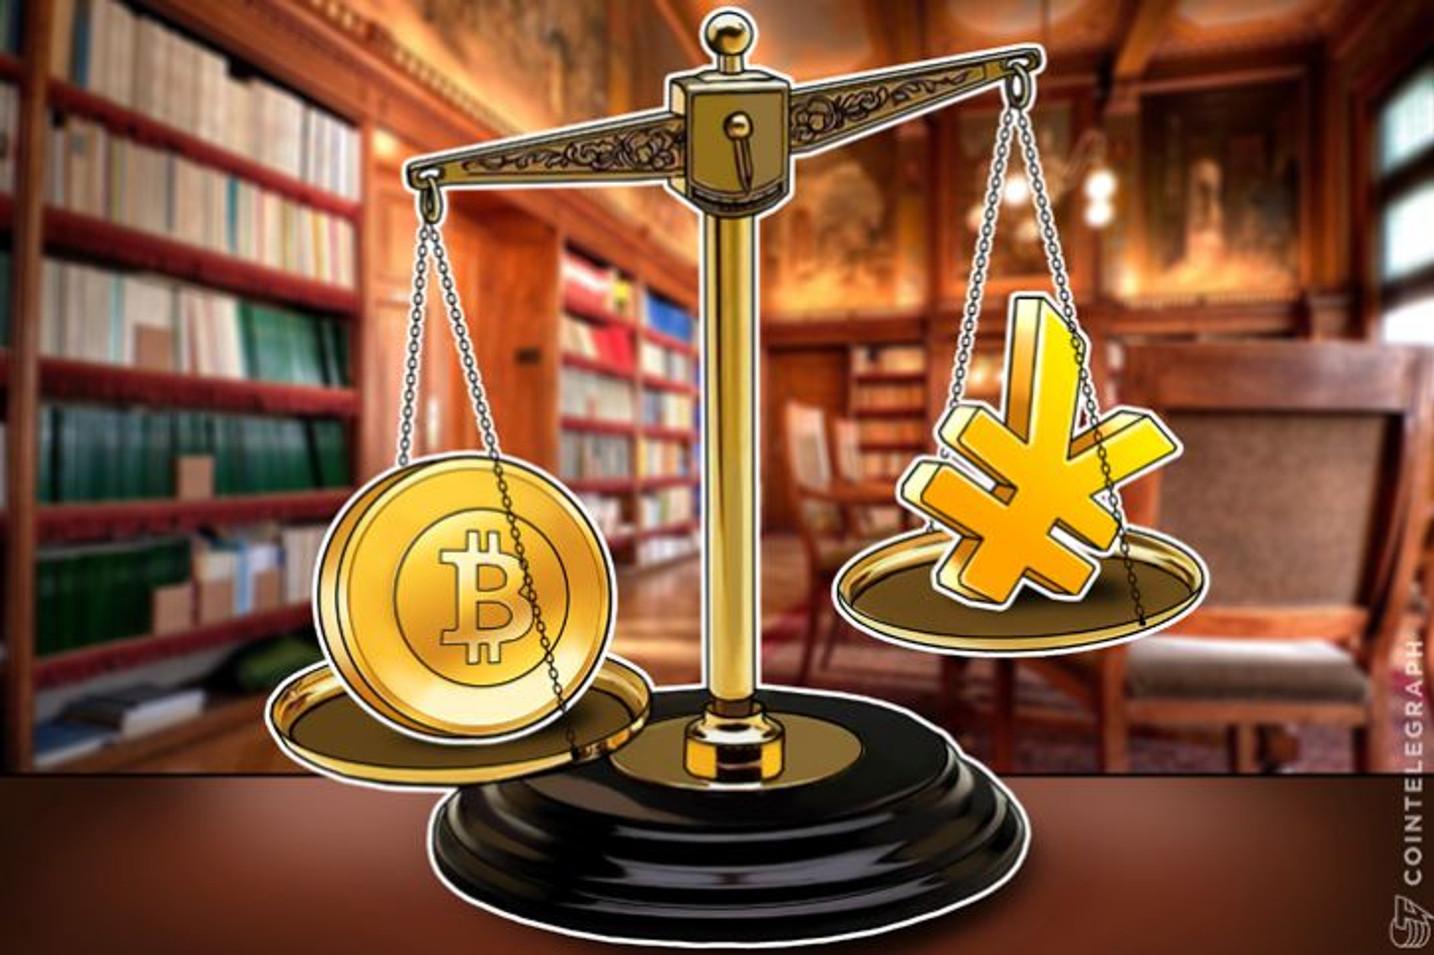 Bitcoin Exchange BTCC Tests Withdrawals Before Deadline, Localbitcoins Set Records